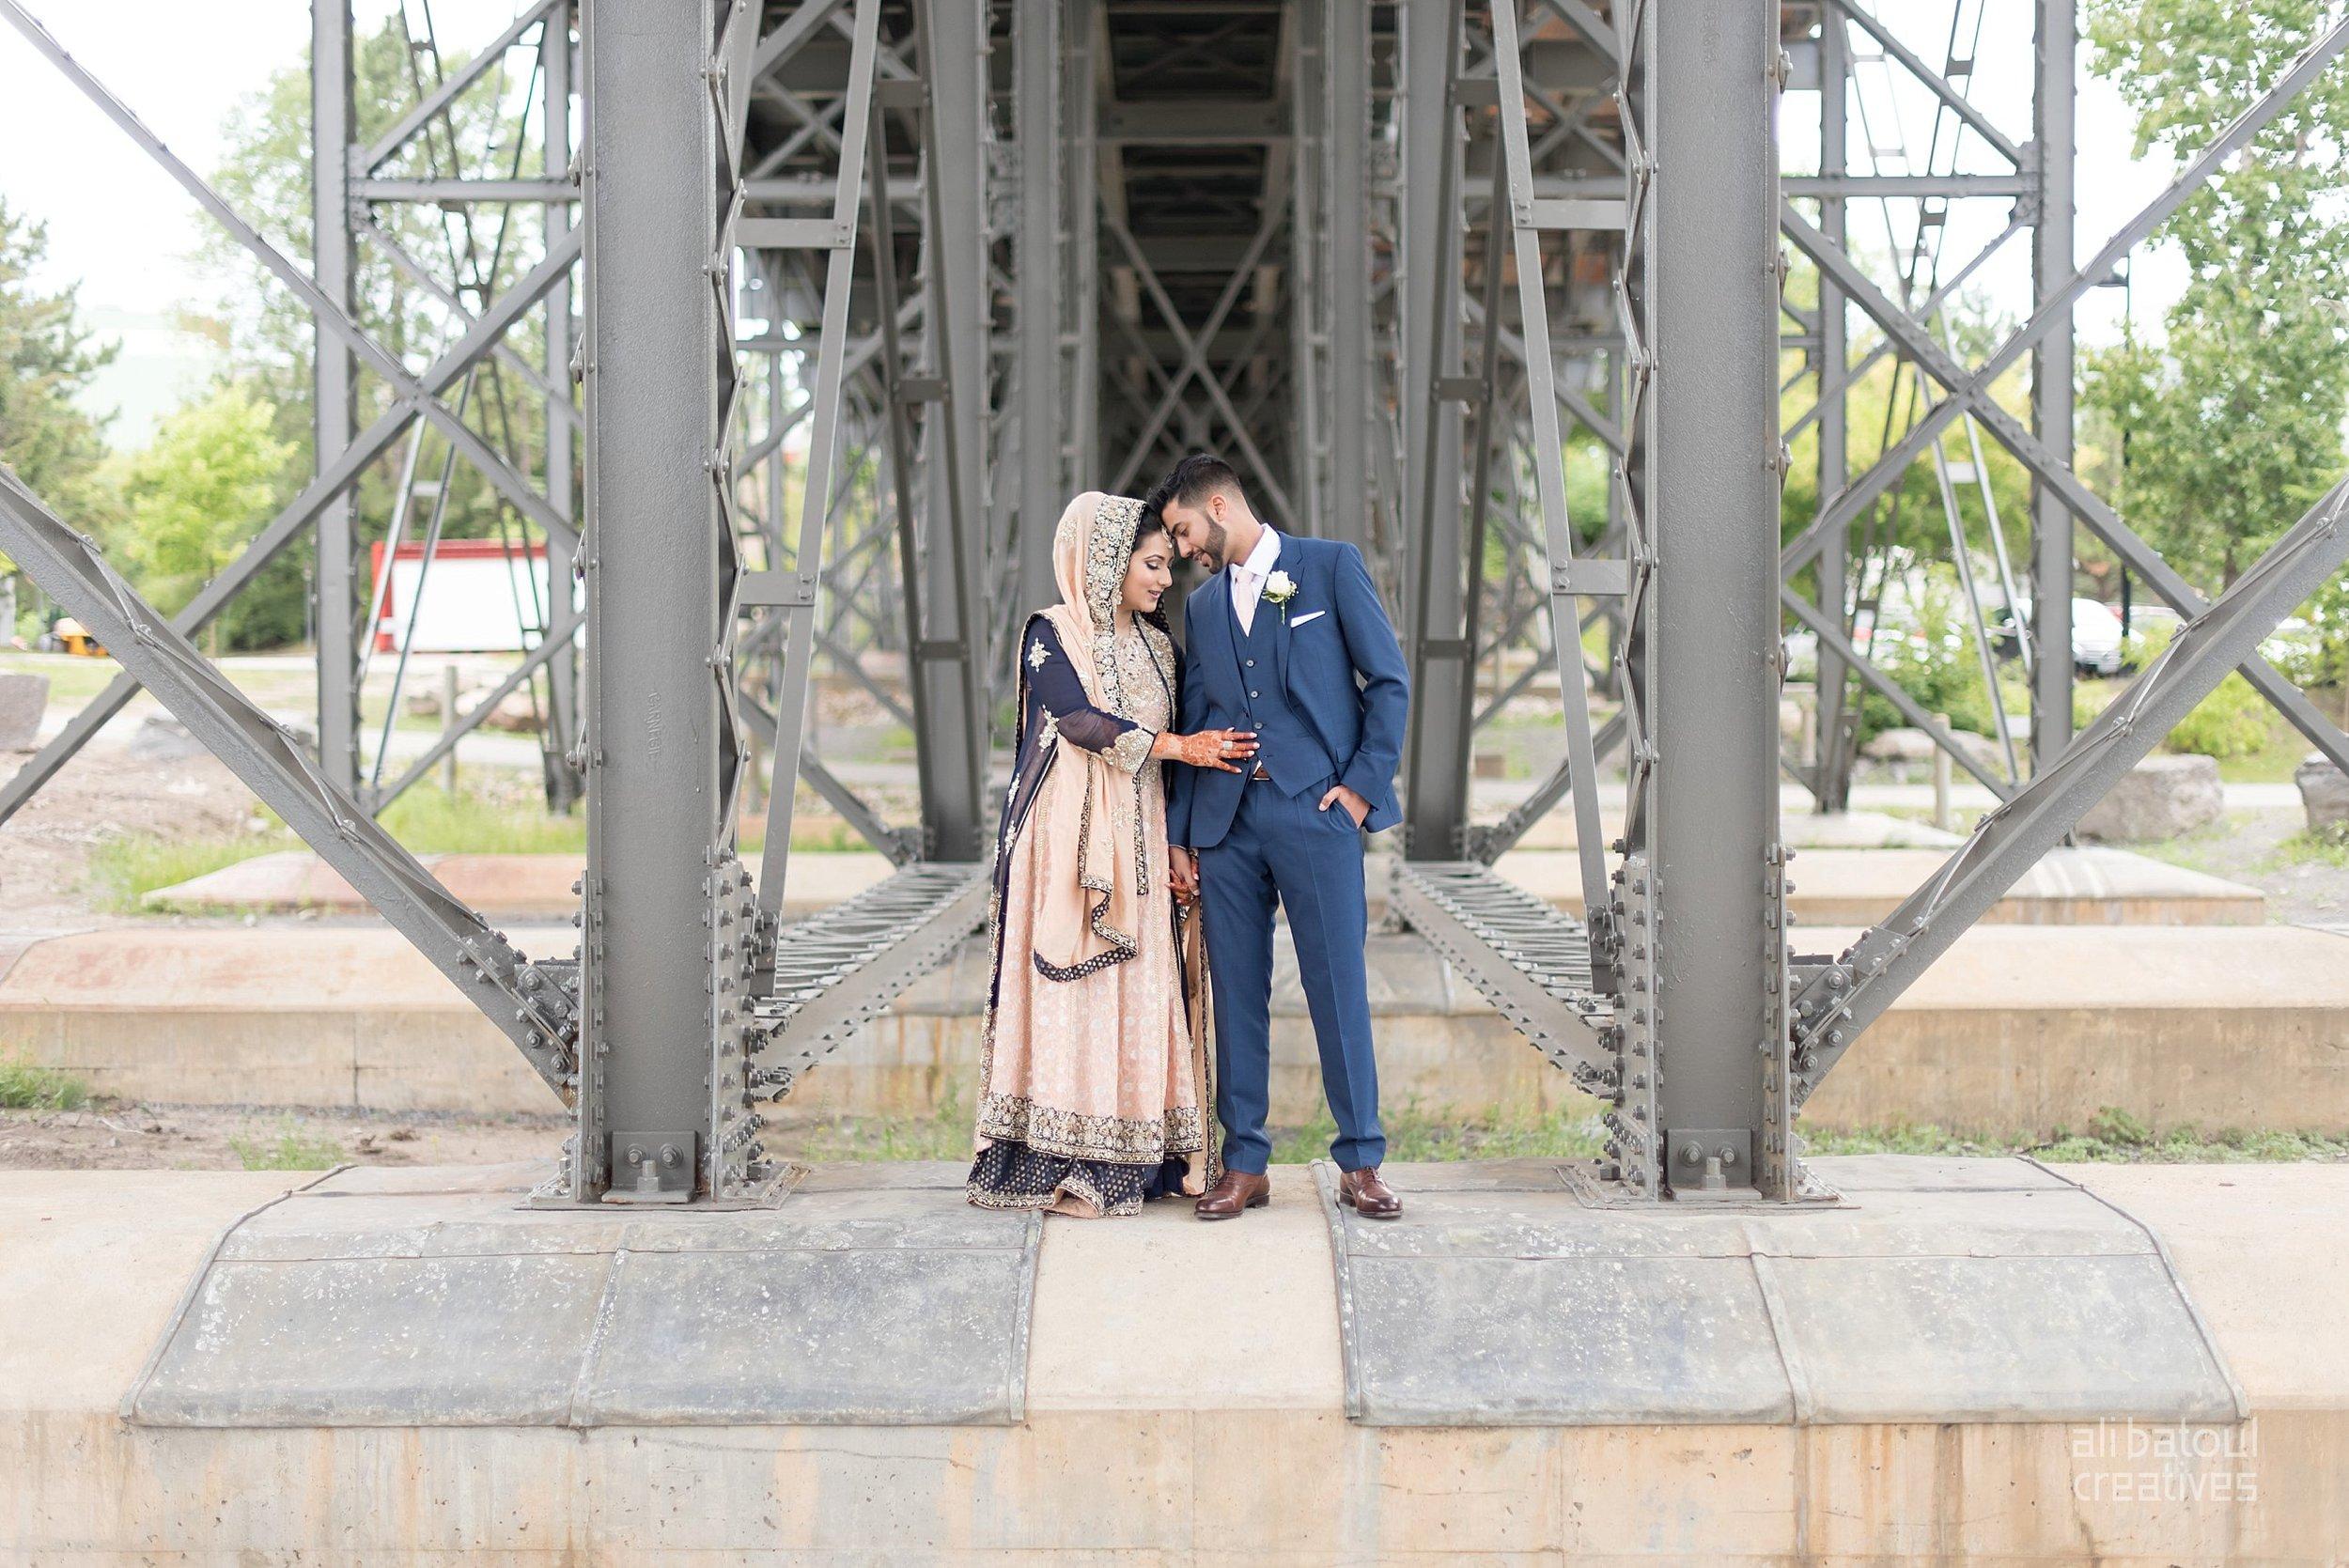 Alina + Mahmood - Ali Batoul Creatives Blog-74_Stomped.jpg